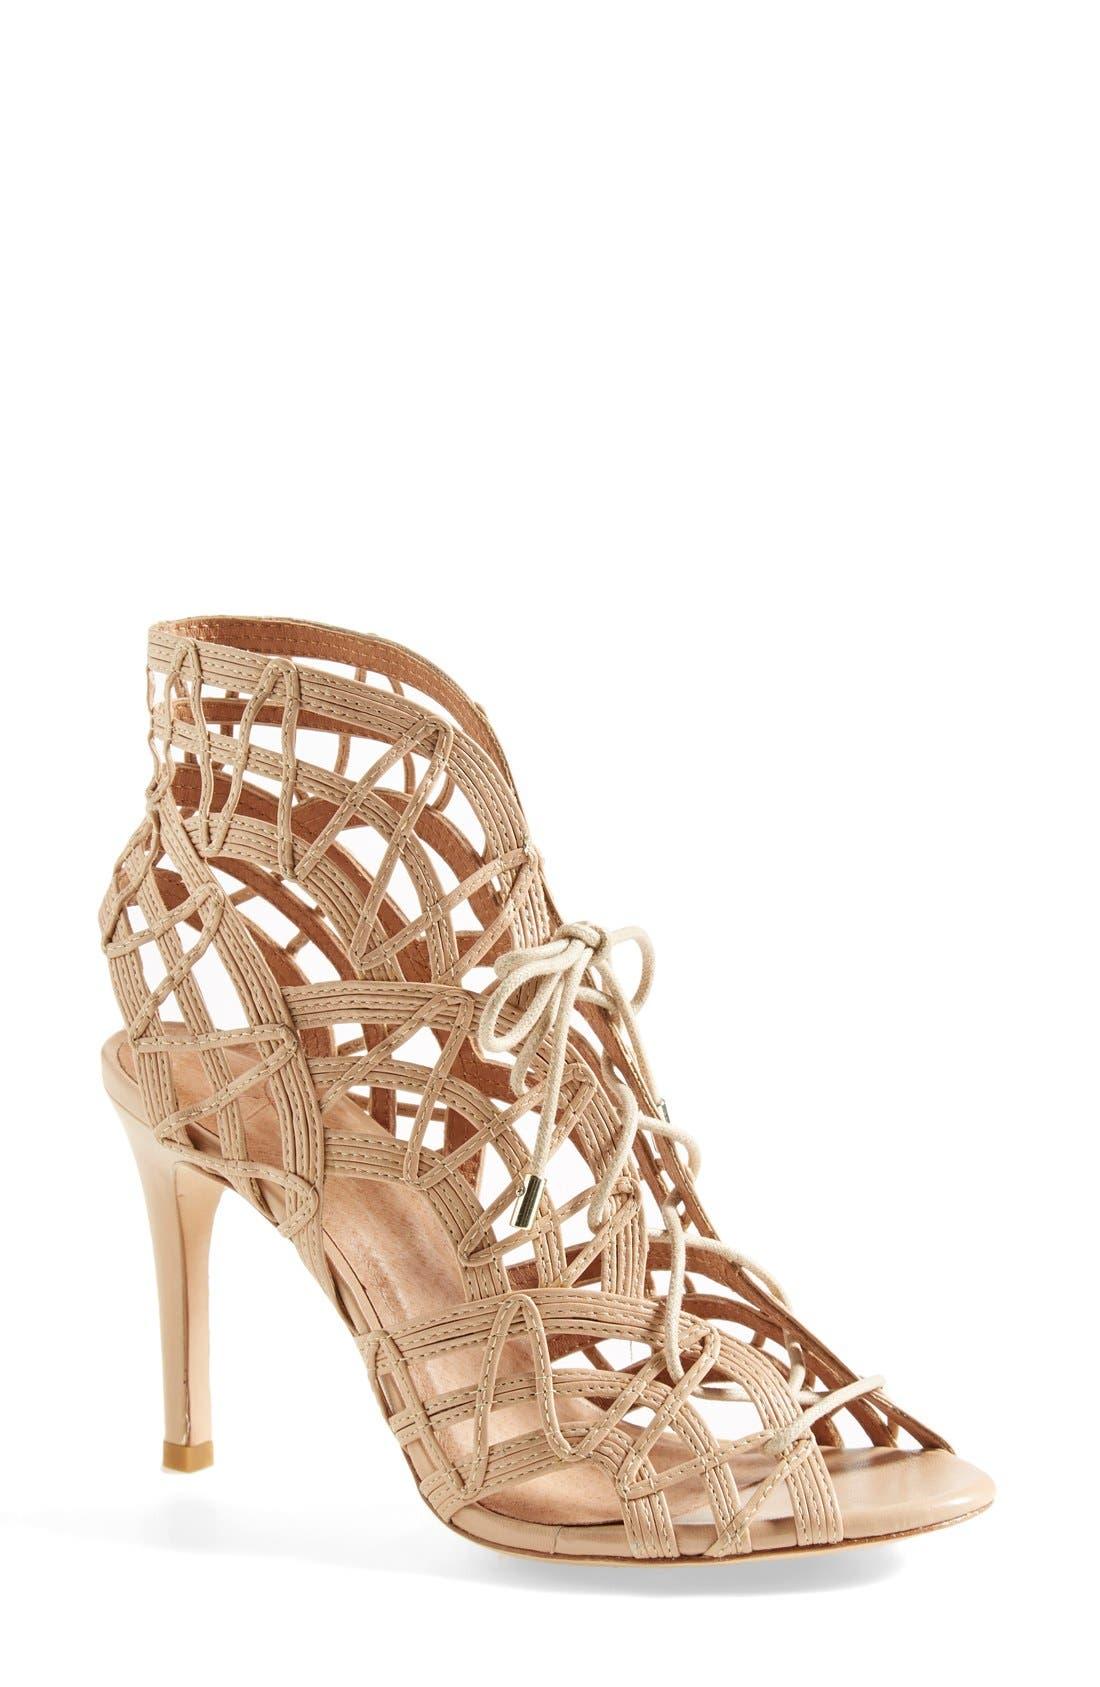 Alternate Image 1 Selected - Joie 'Leah' Lace-Up Sandal (Women)